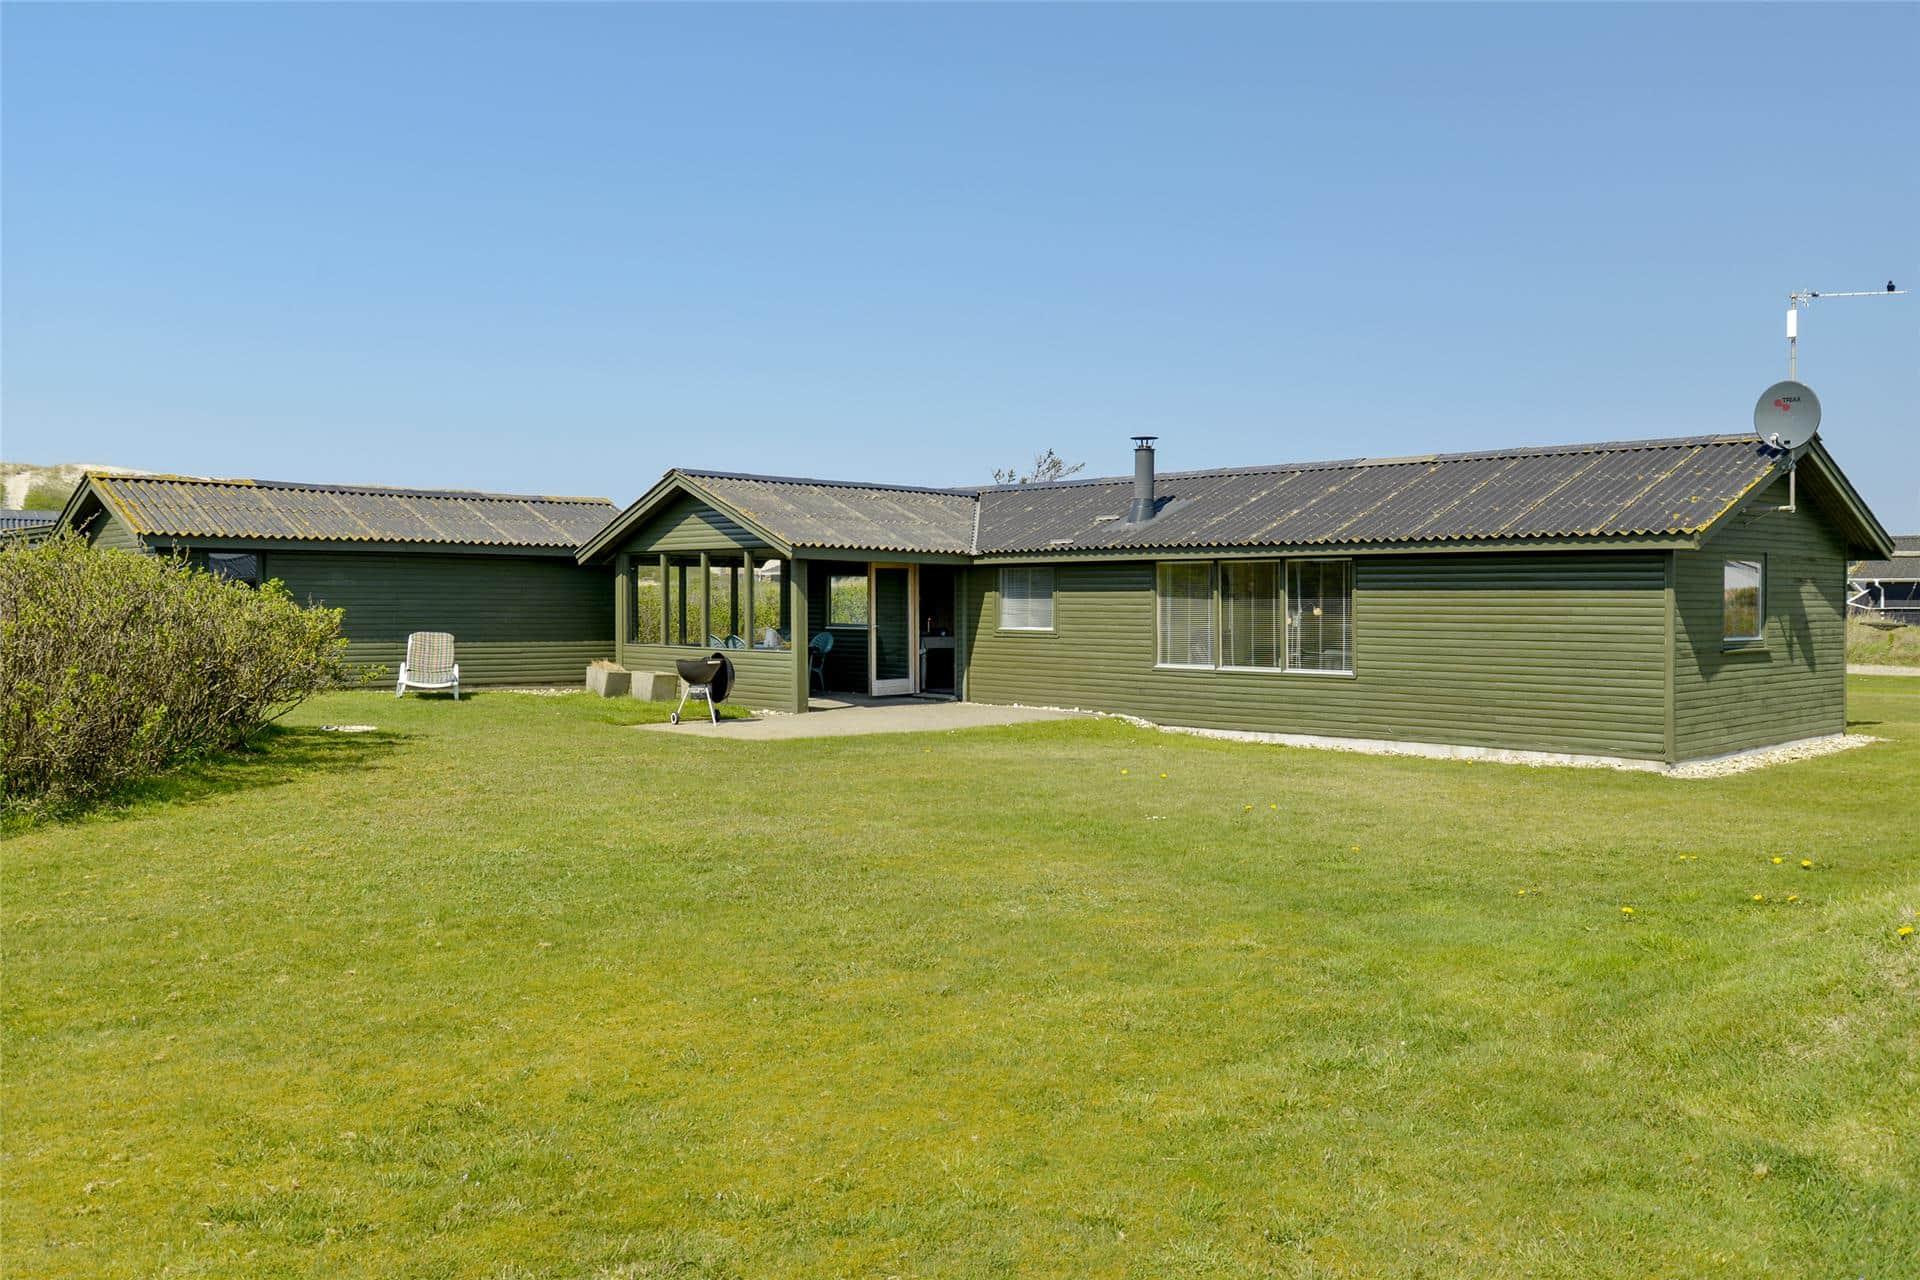 Bild 1-4 Ferienhaus 421, Granvej 26, DK - 6960 Hvide Sande